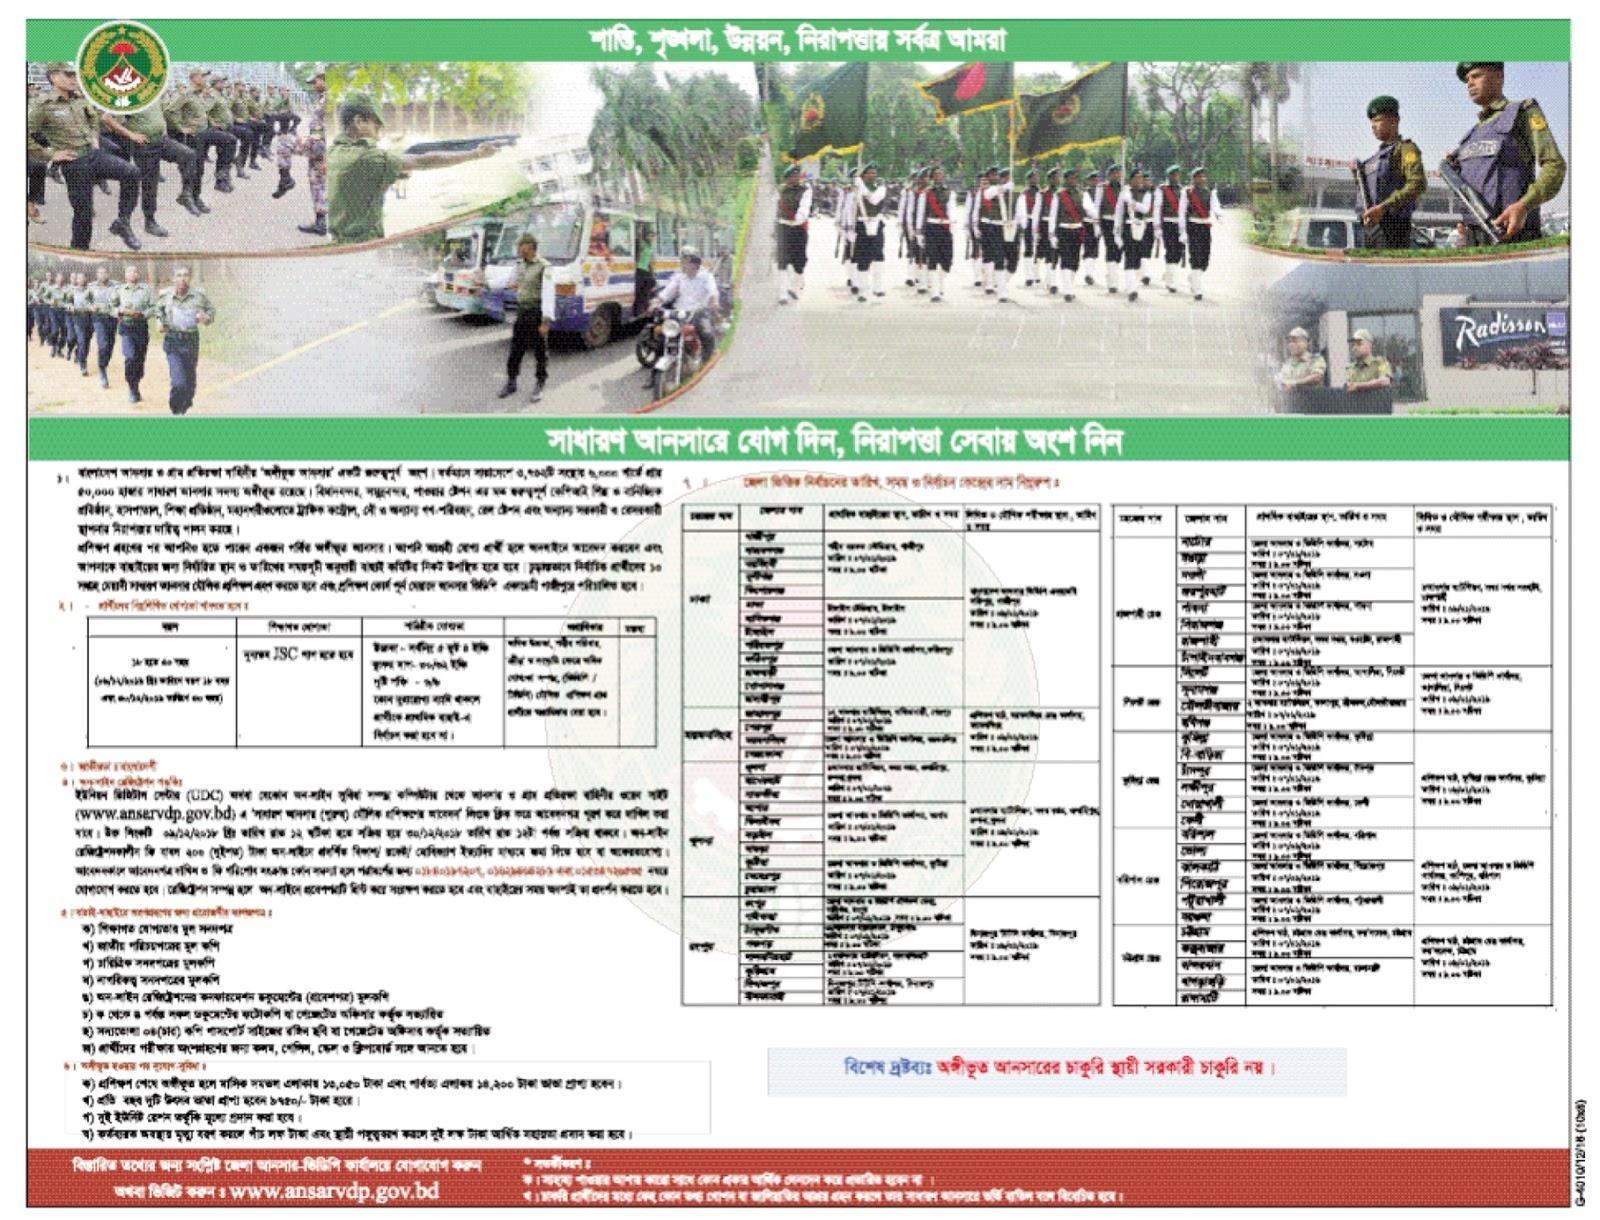 Bangladesh Ansar VDP Recruitment General Ansar Basic Training Circular 2018